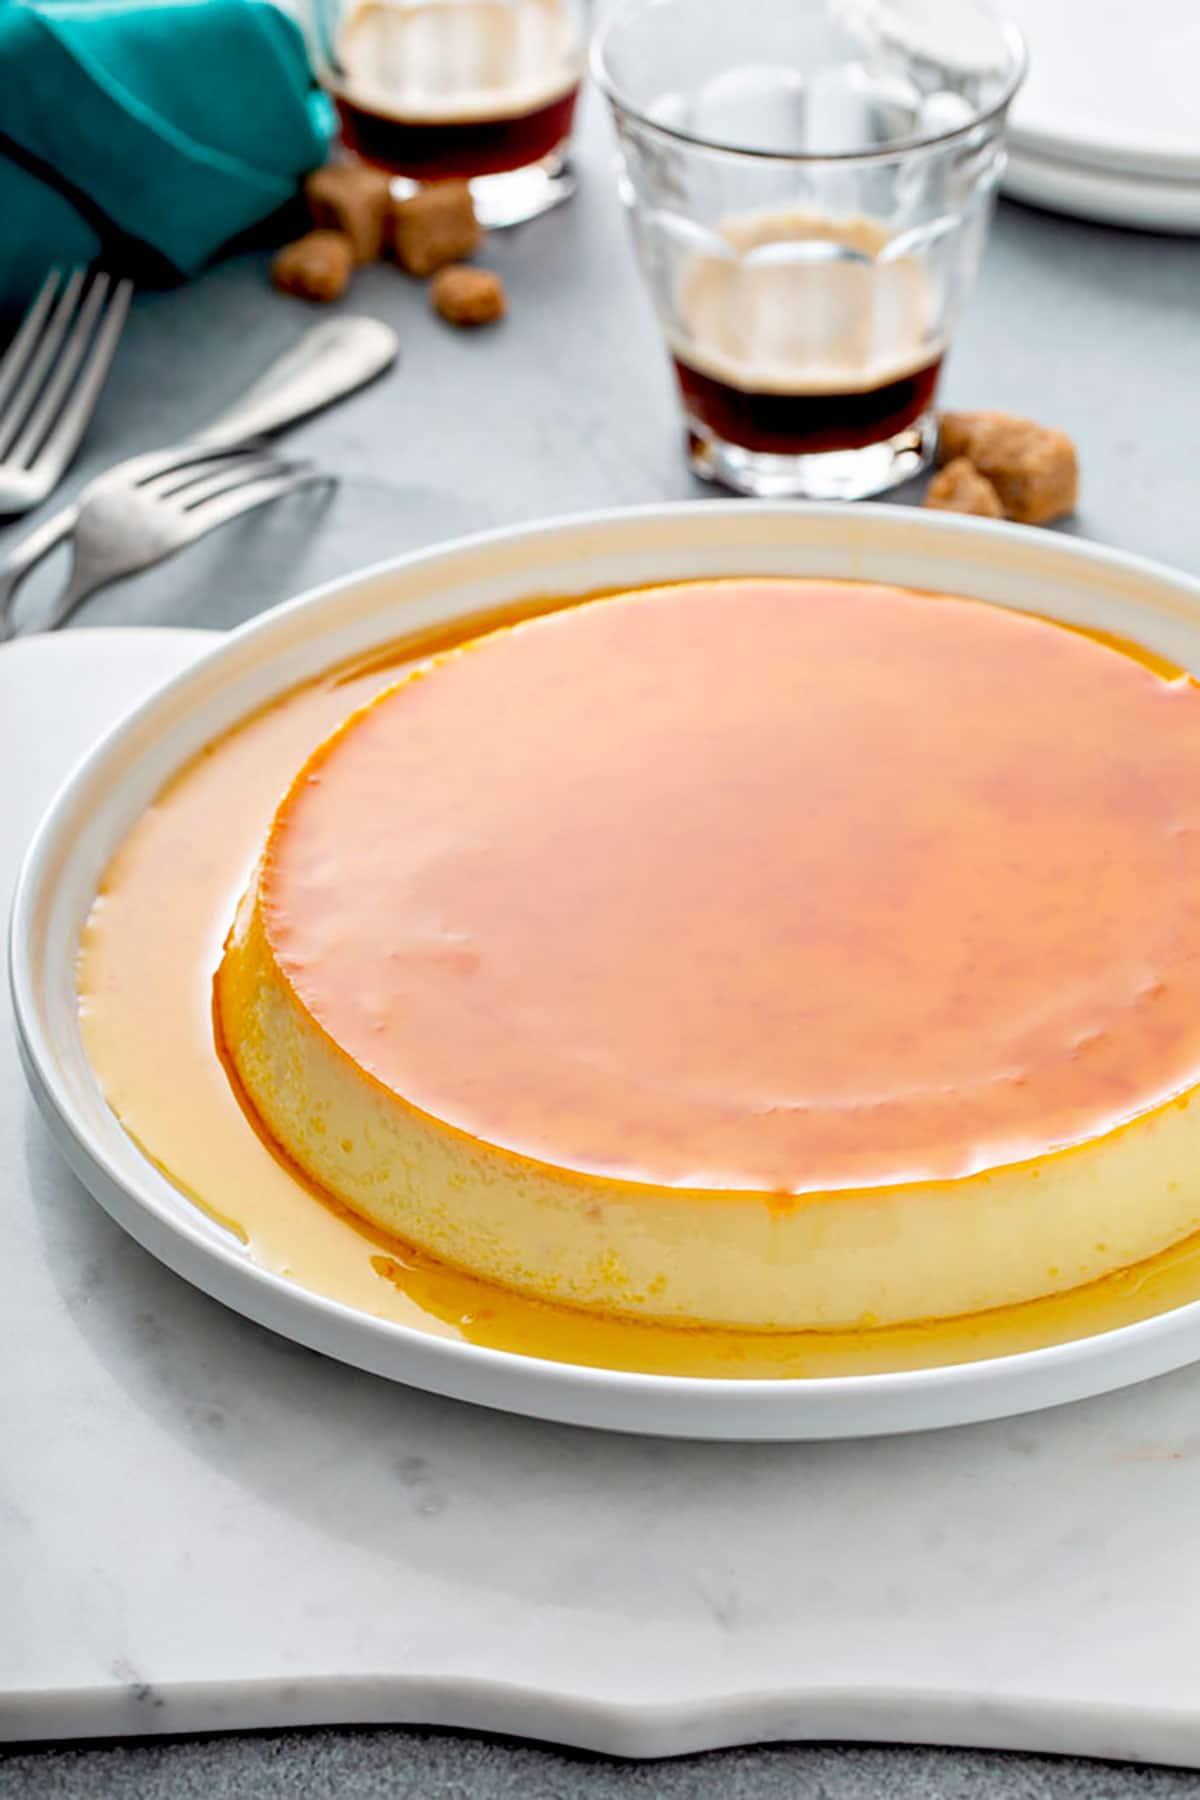 Creme Caramel or caramel flan with golden caramel on a white plate